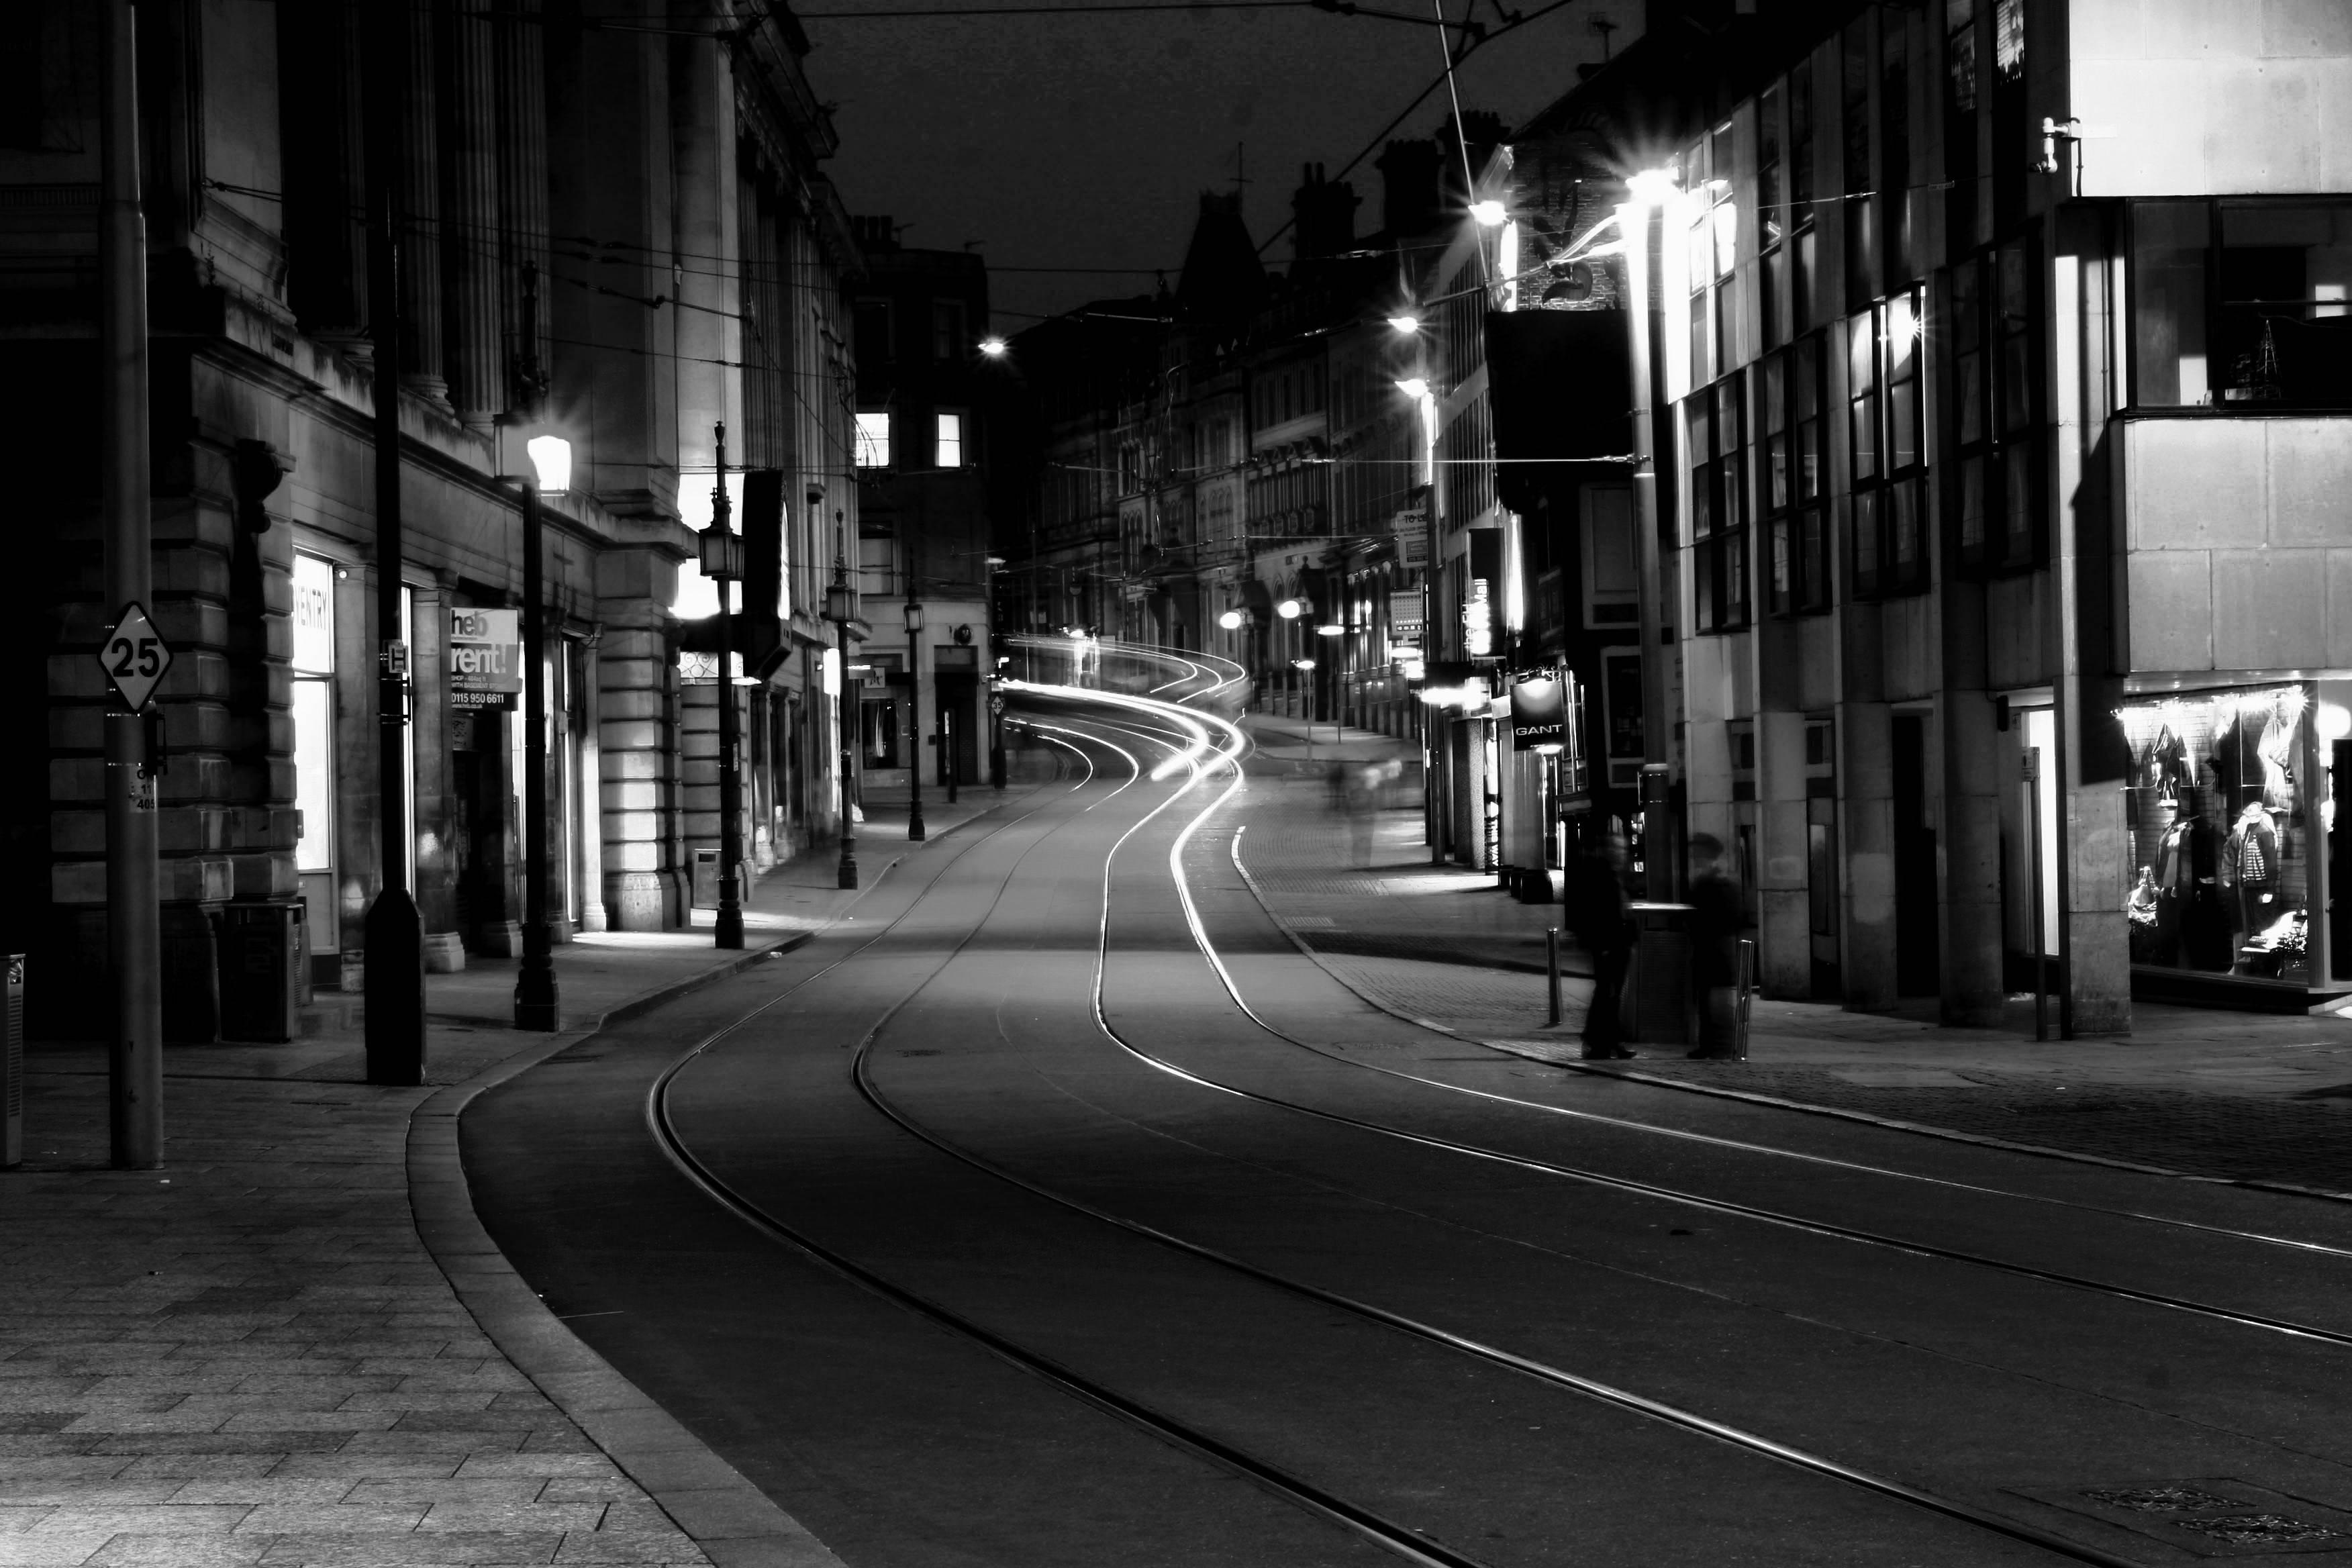 Empty City Street Background image gallery 3504x2336